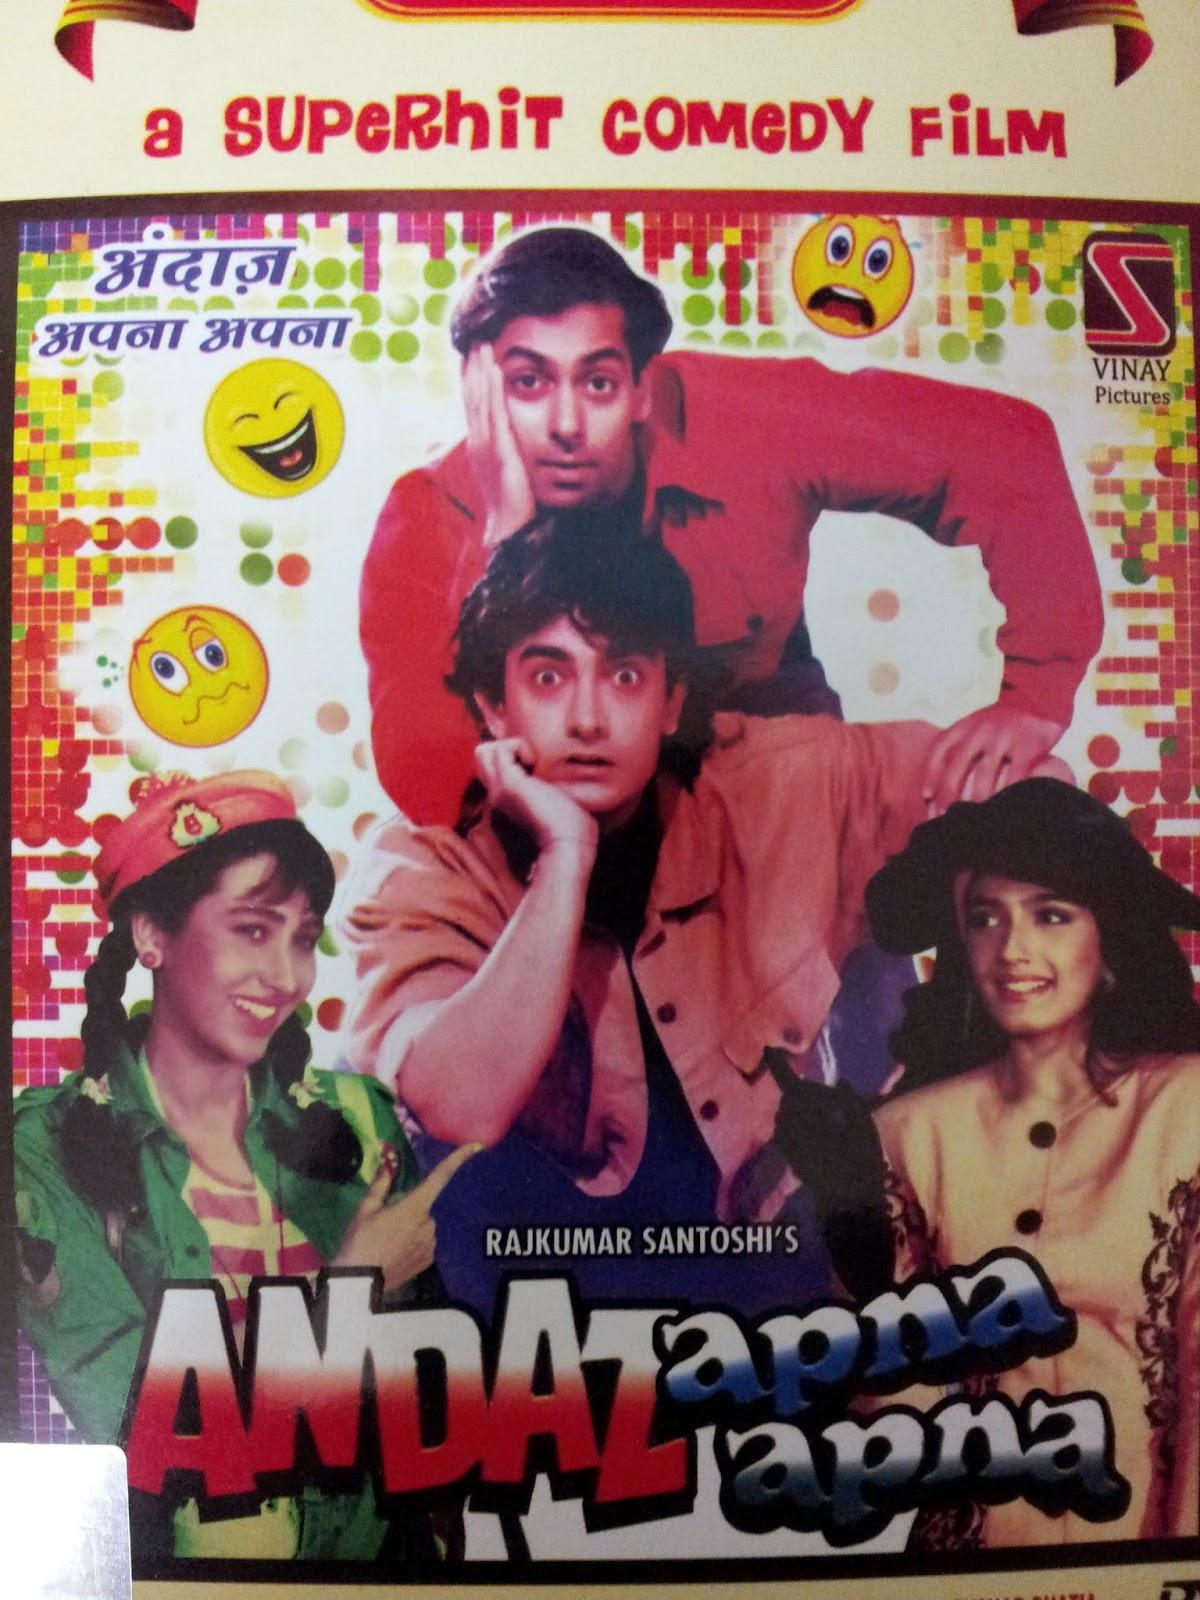 Andaz apna apna photos Cool and Funny WhatsApp Group Names for Friends